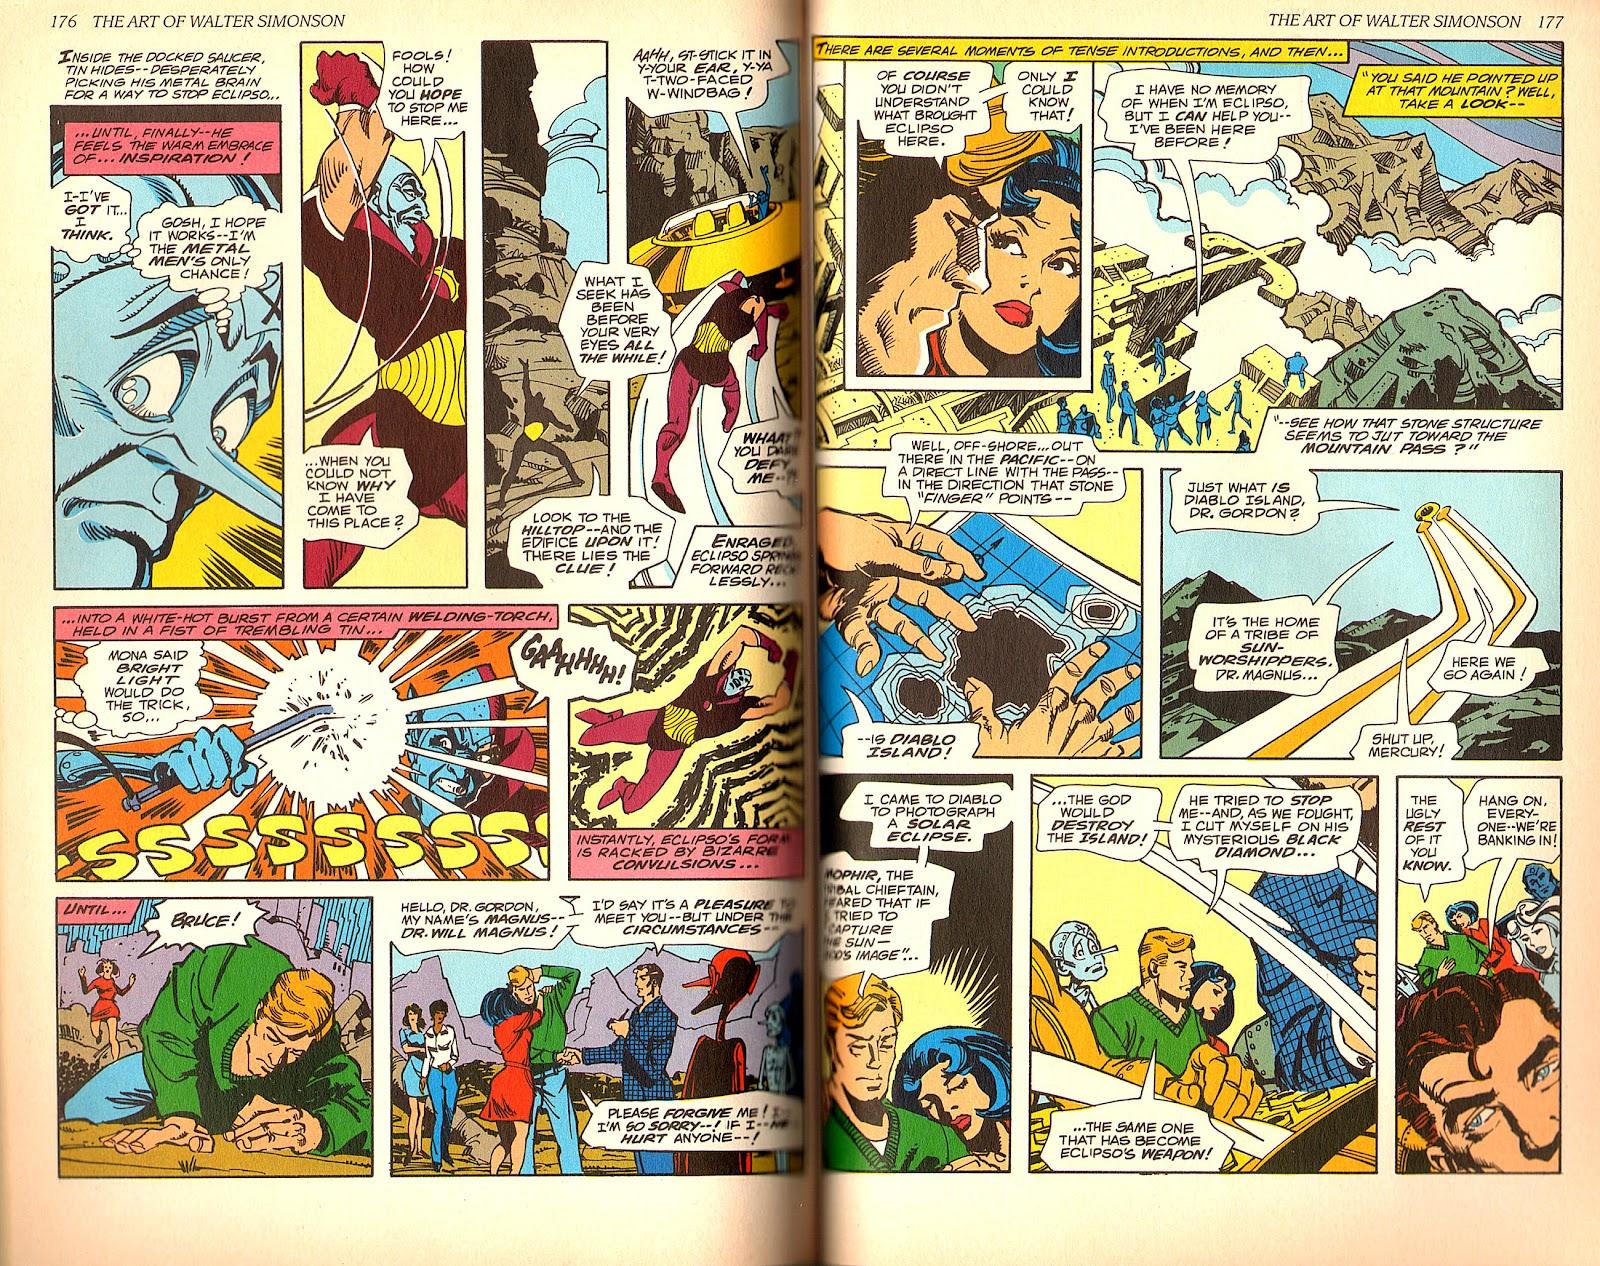 Read online The Art of Walter Simonson comic -  Issue # TPB - 90